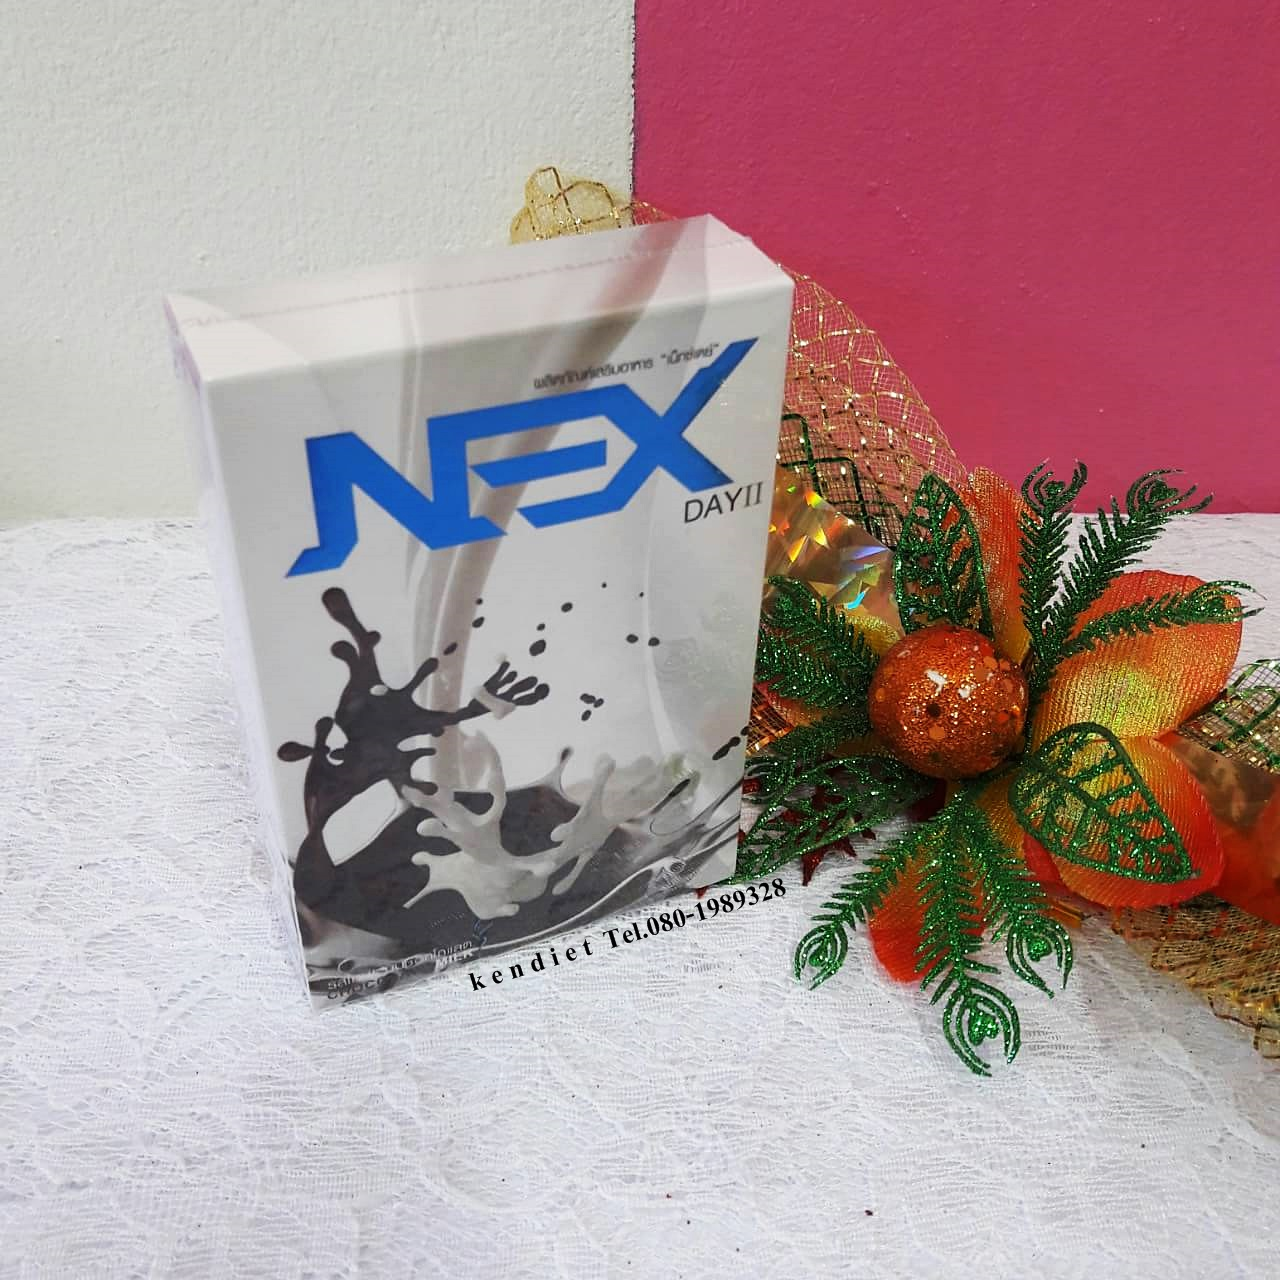 NEXDAY อาหารเสริมเน็กซ์เดย์ ลดน้ำหนัก รสนมชอกโกแลต อาหารเสริมลดสัดส่วน 10 ซอง 650 บาท